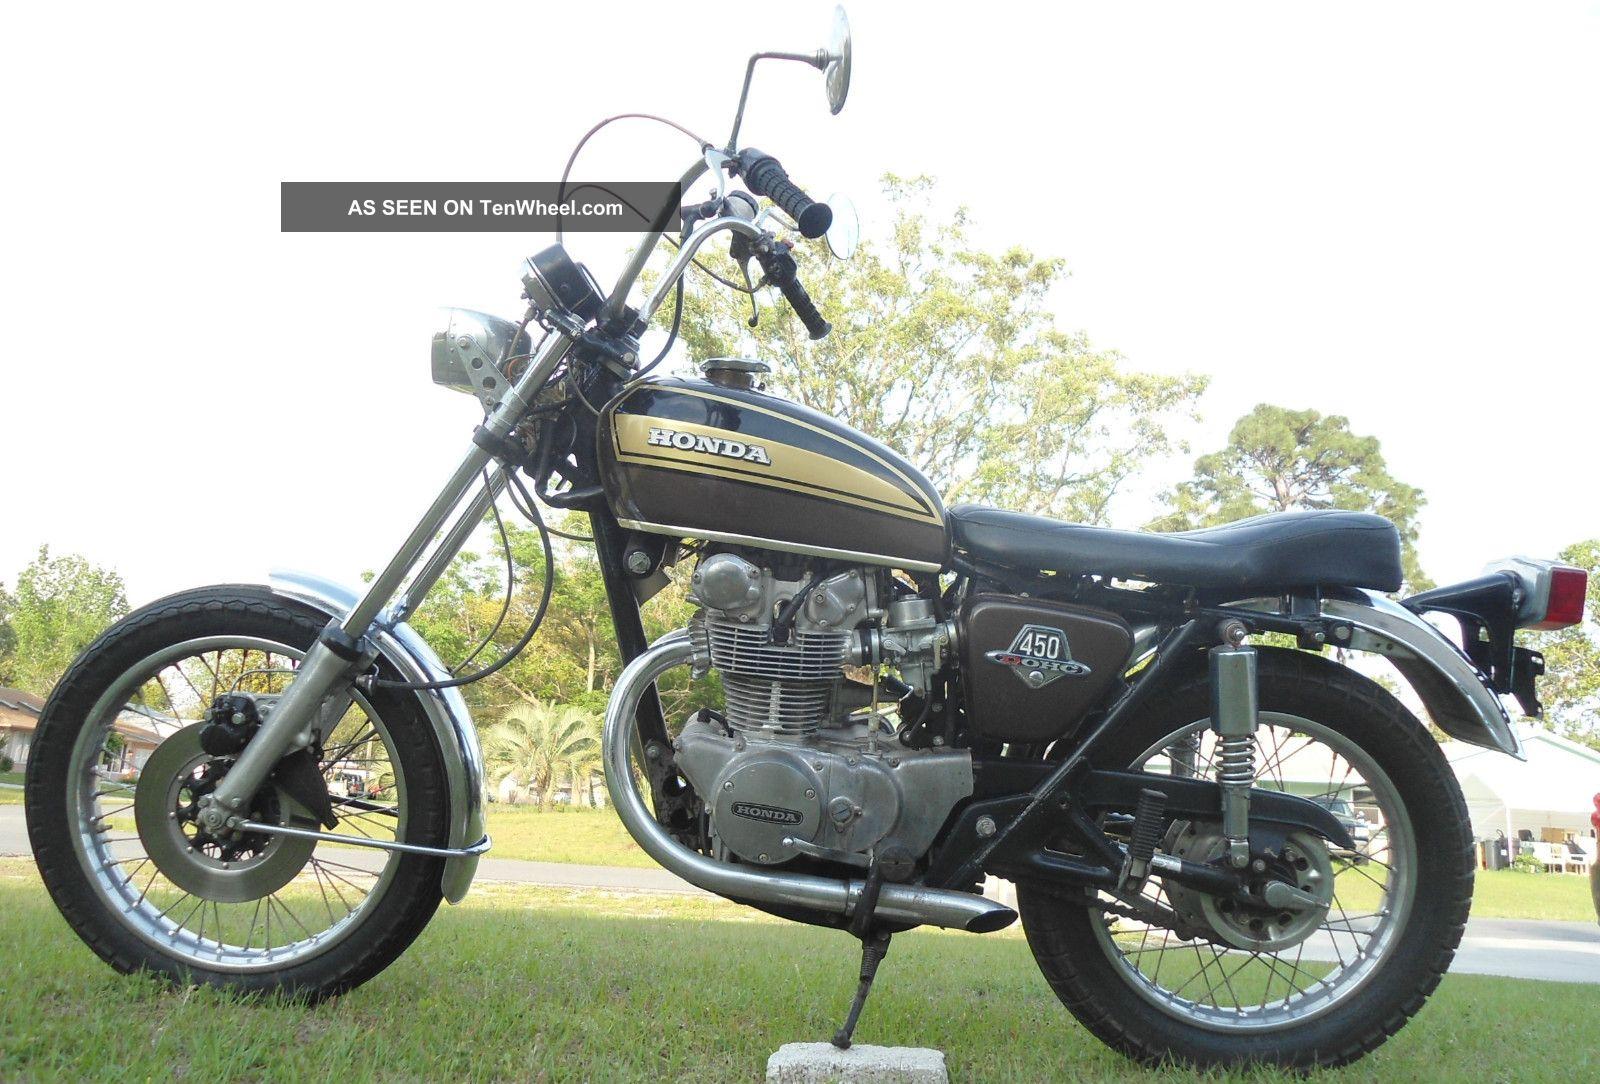 1974 Honda Cb450 Cb 450 Dohc Chopper Easy Rider CB photo